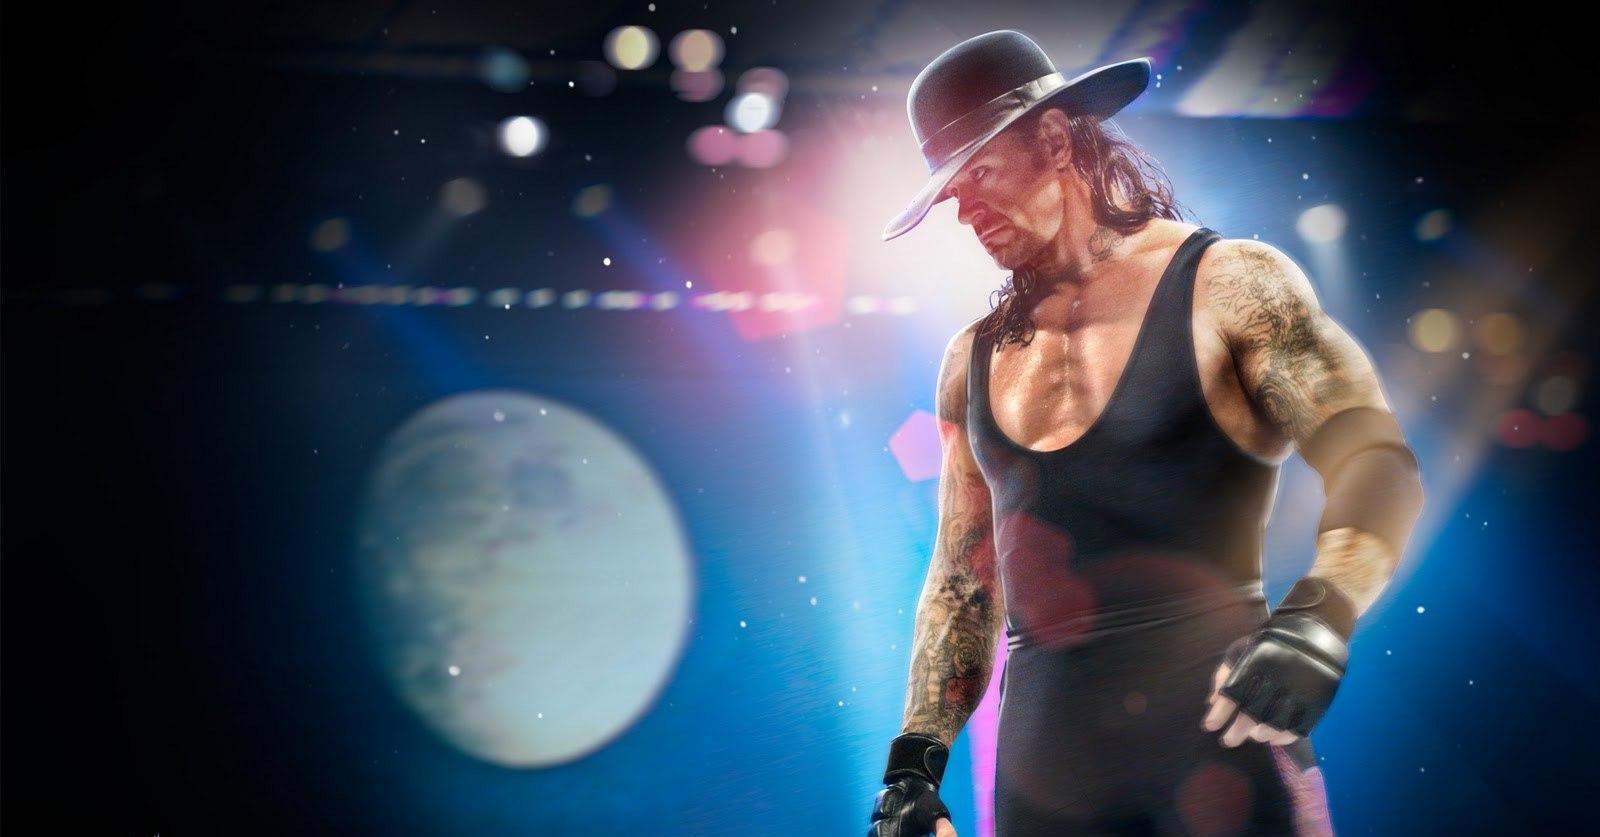 Kane Wwe Latest Hd Wallpaper 2013 14: Wrestling Super Stars: UnderTaker New HD Wallpaper 2013